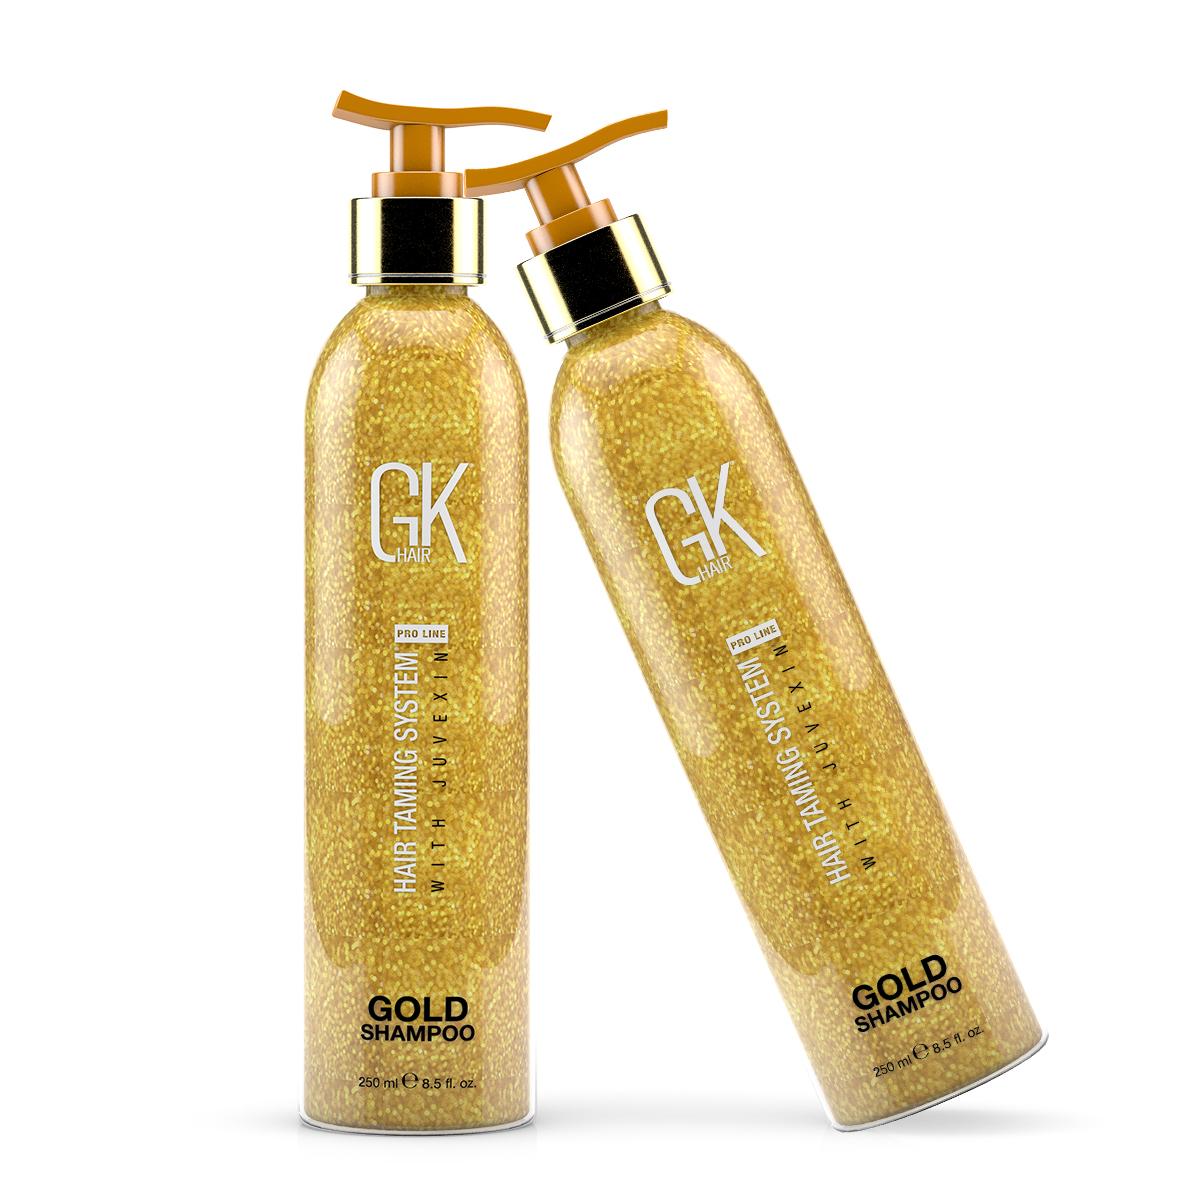 Шампунь золотой Global Keratin Gold Shampoo 250 мл.